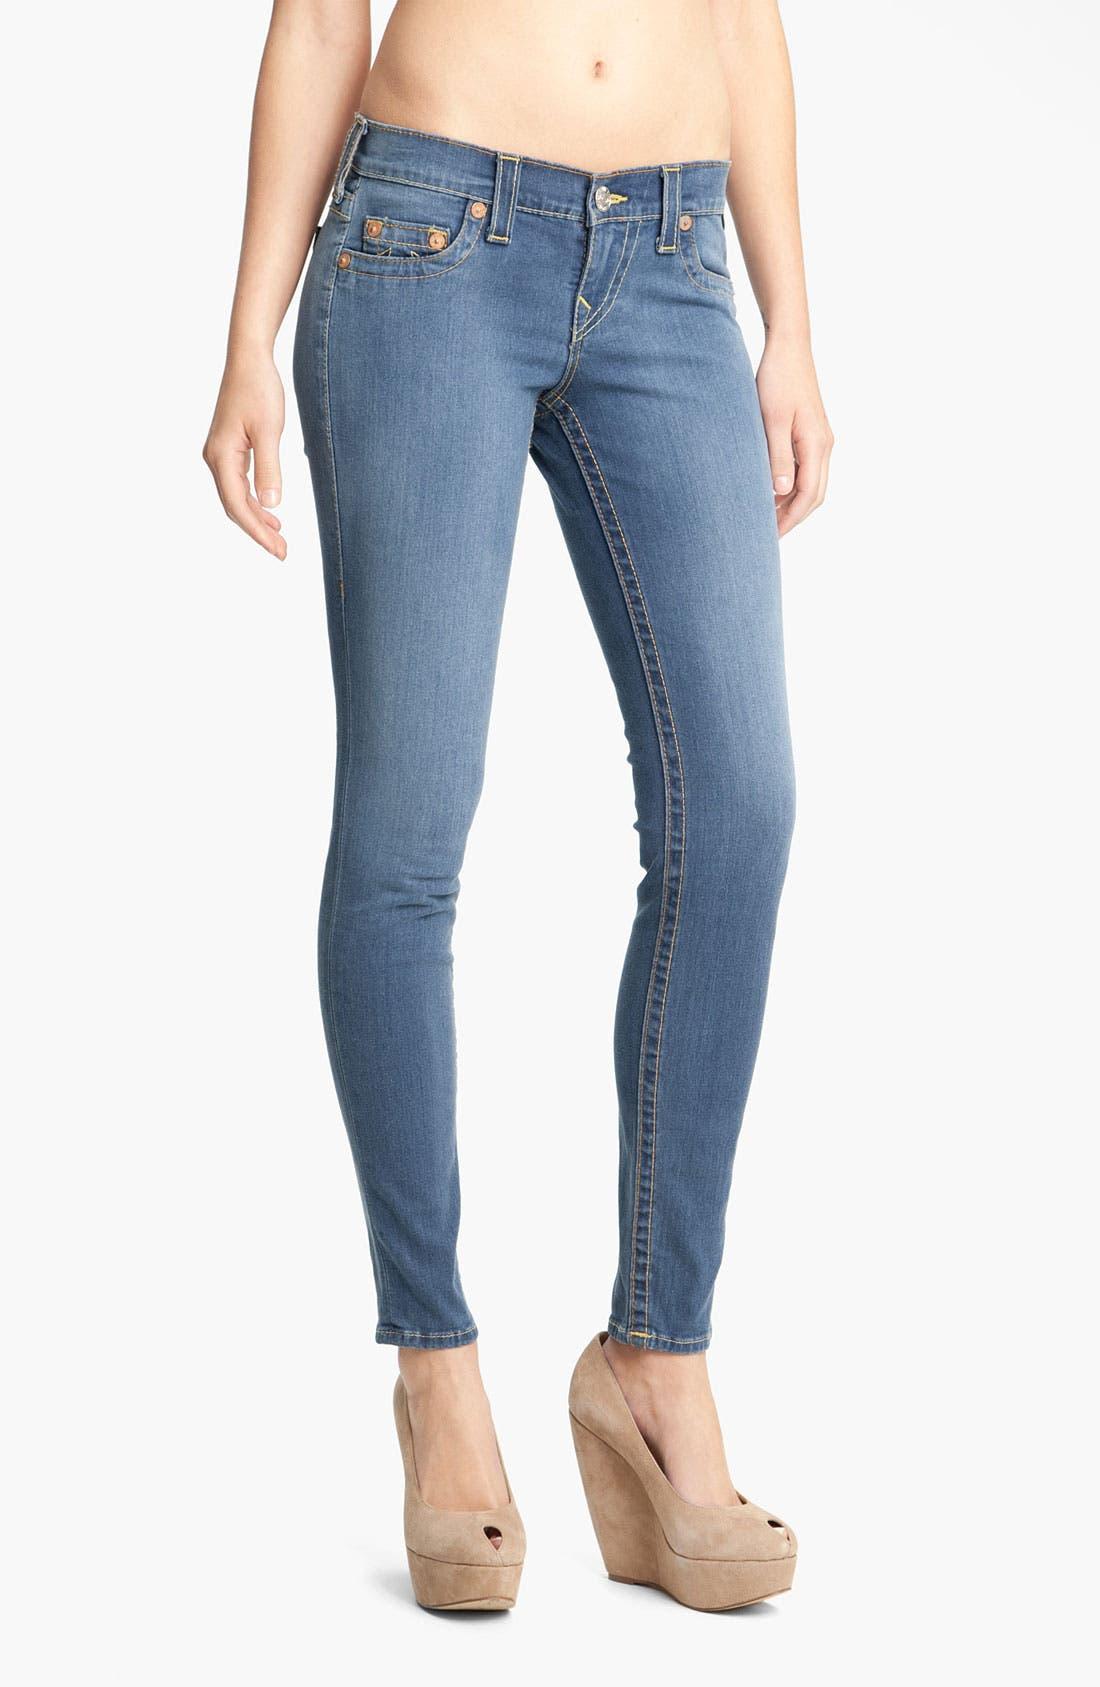 Main Image - True Religion Brand Jeans 'Casey' Skinny Stretch Jeans (Stingray)